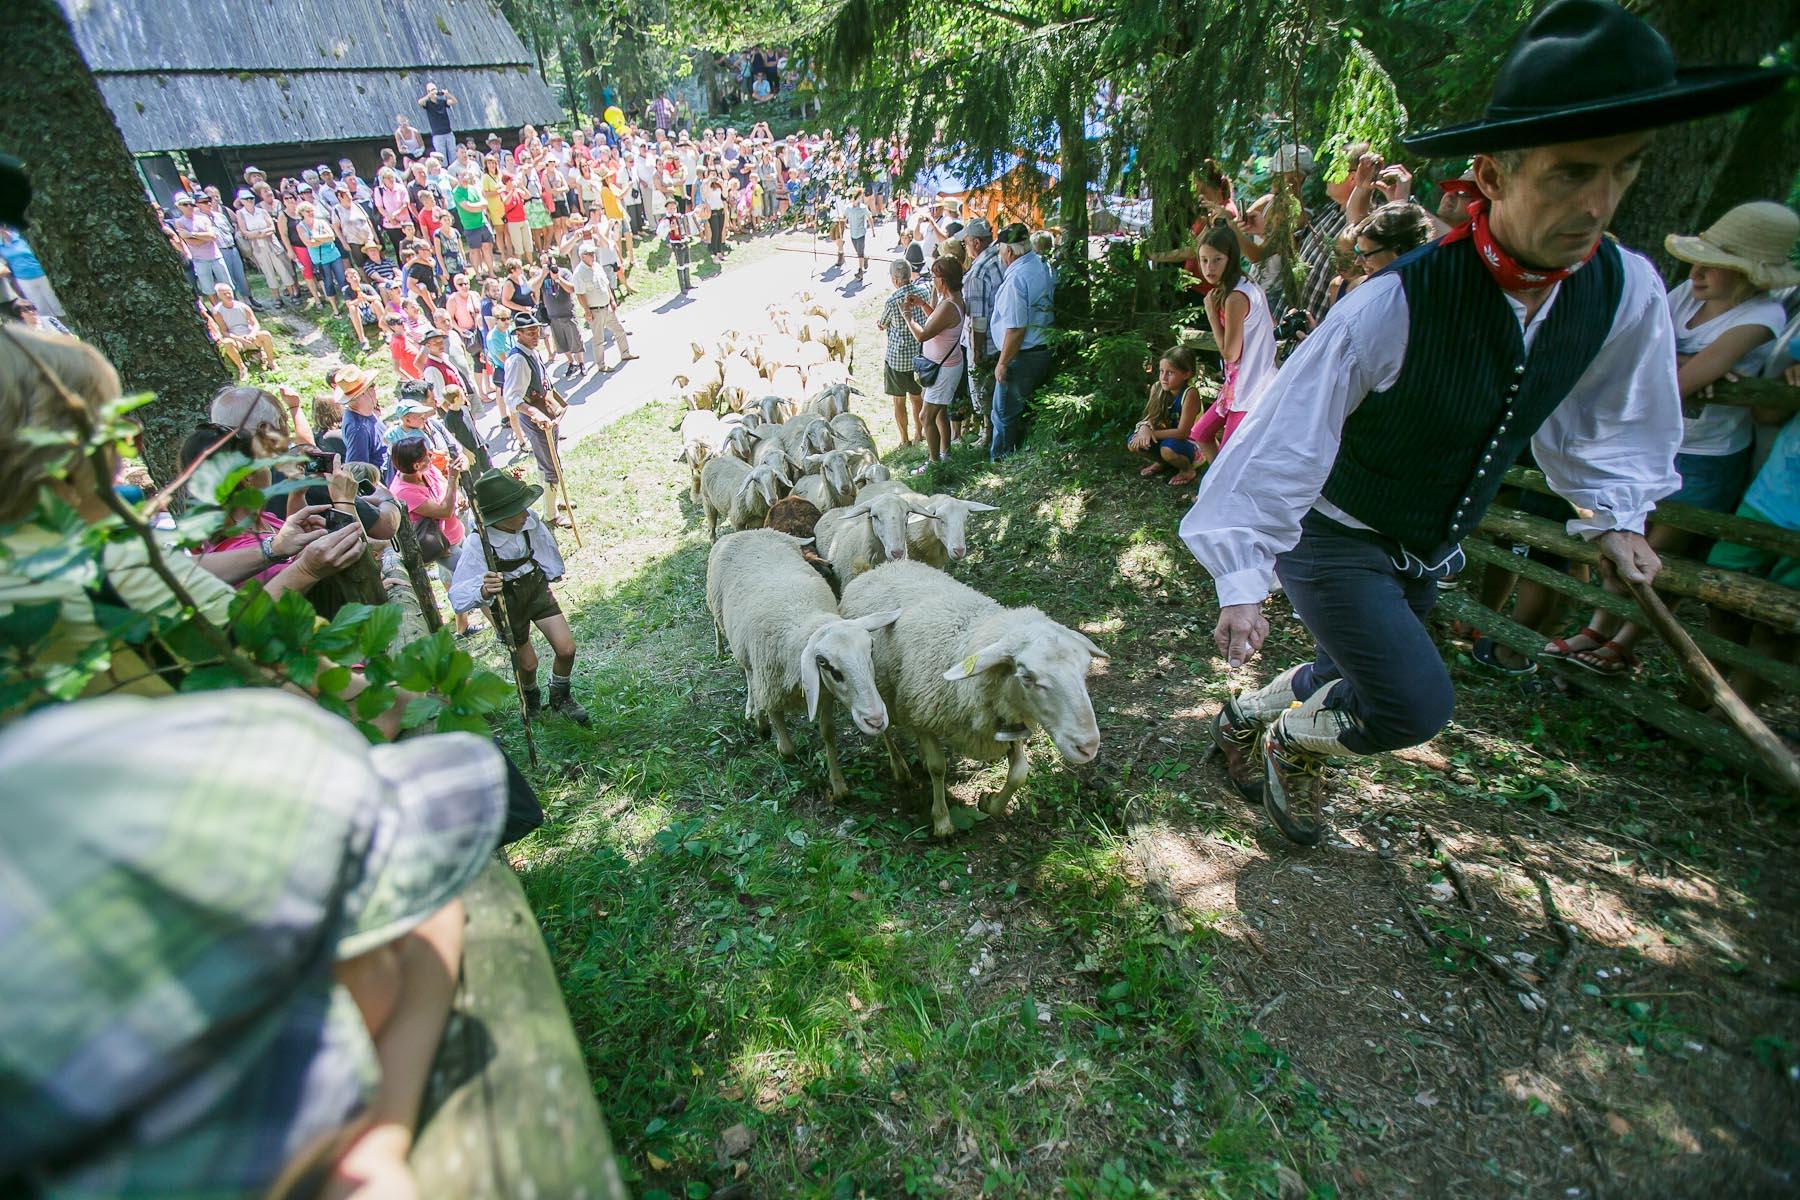 Shepherds herd the sheep to the 57th annual Shepherds Ball in Jezersko, Slovenia.